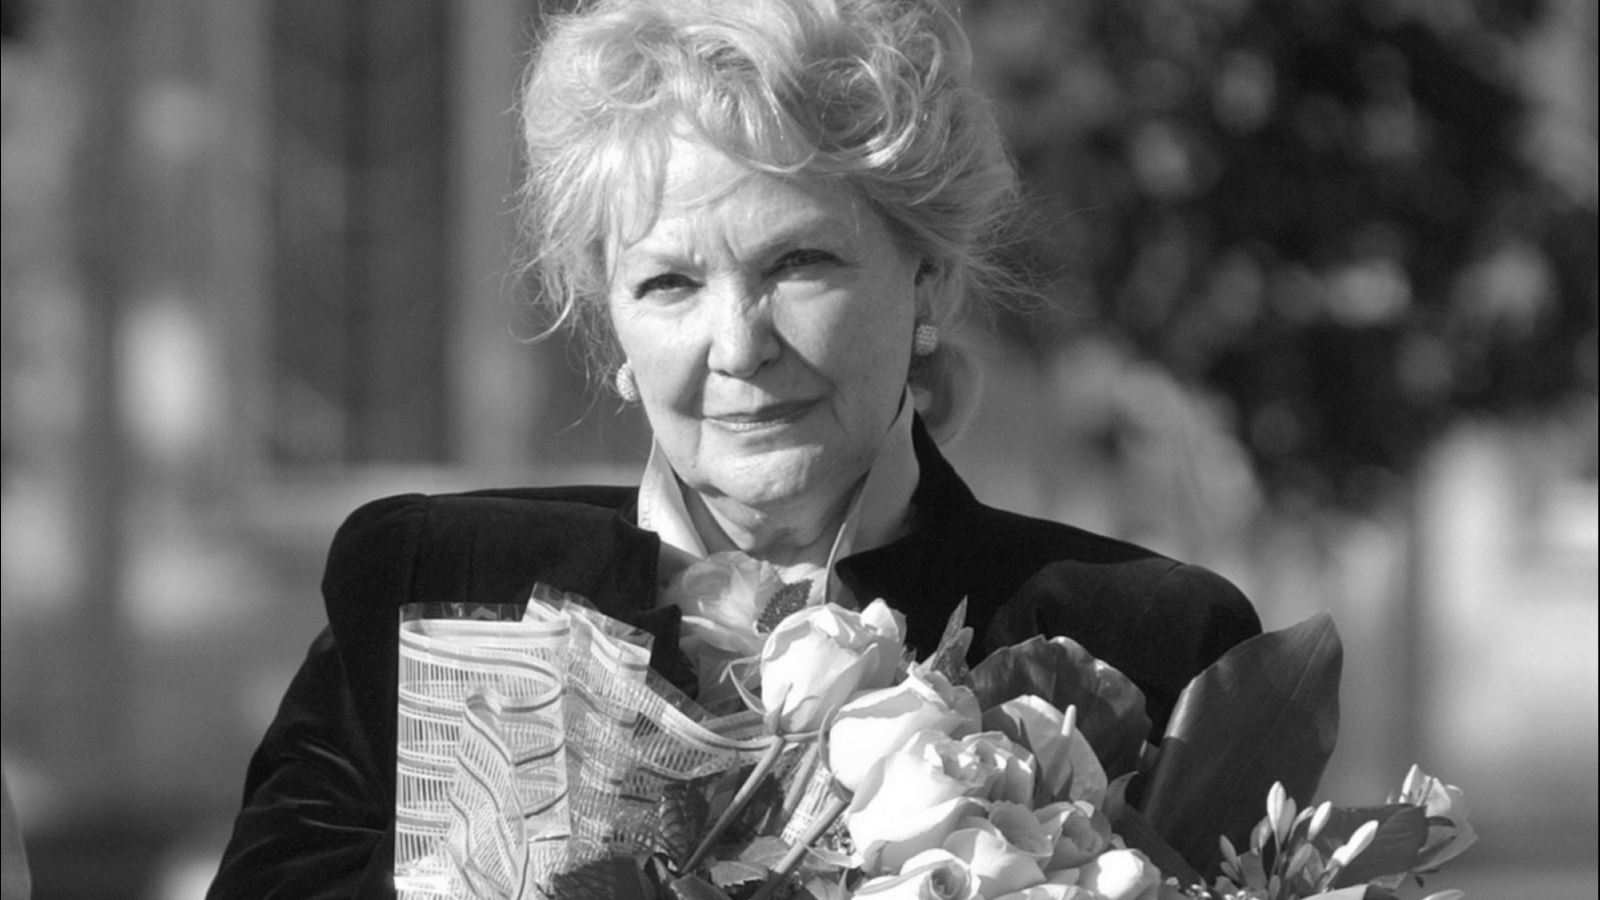 Умерла легендарная советская актриса и мать Федора Бондарчука — Ирина Скобцева